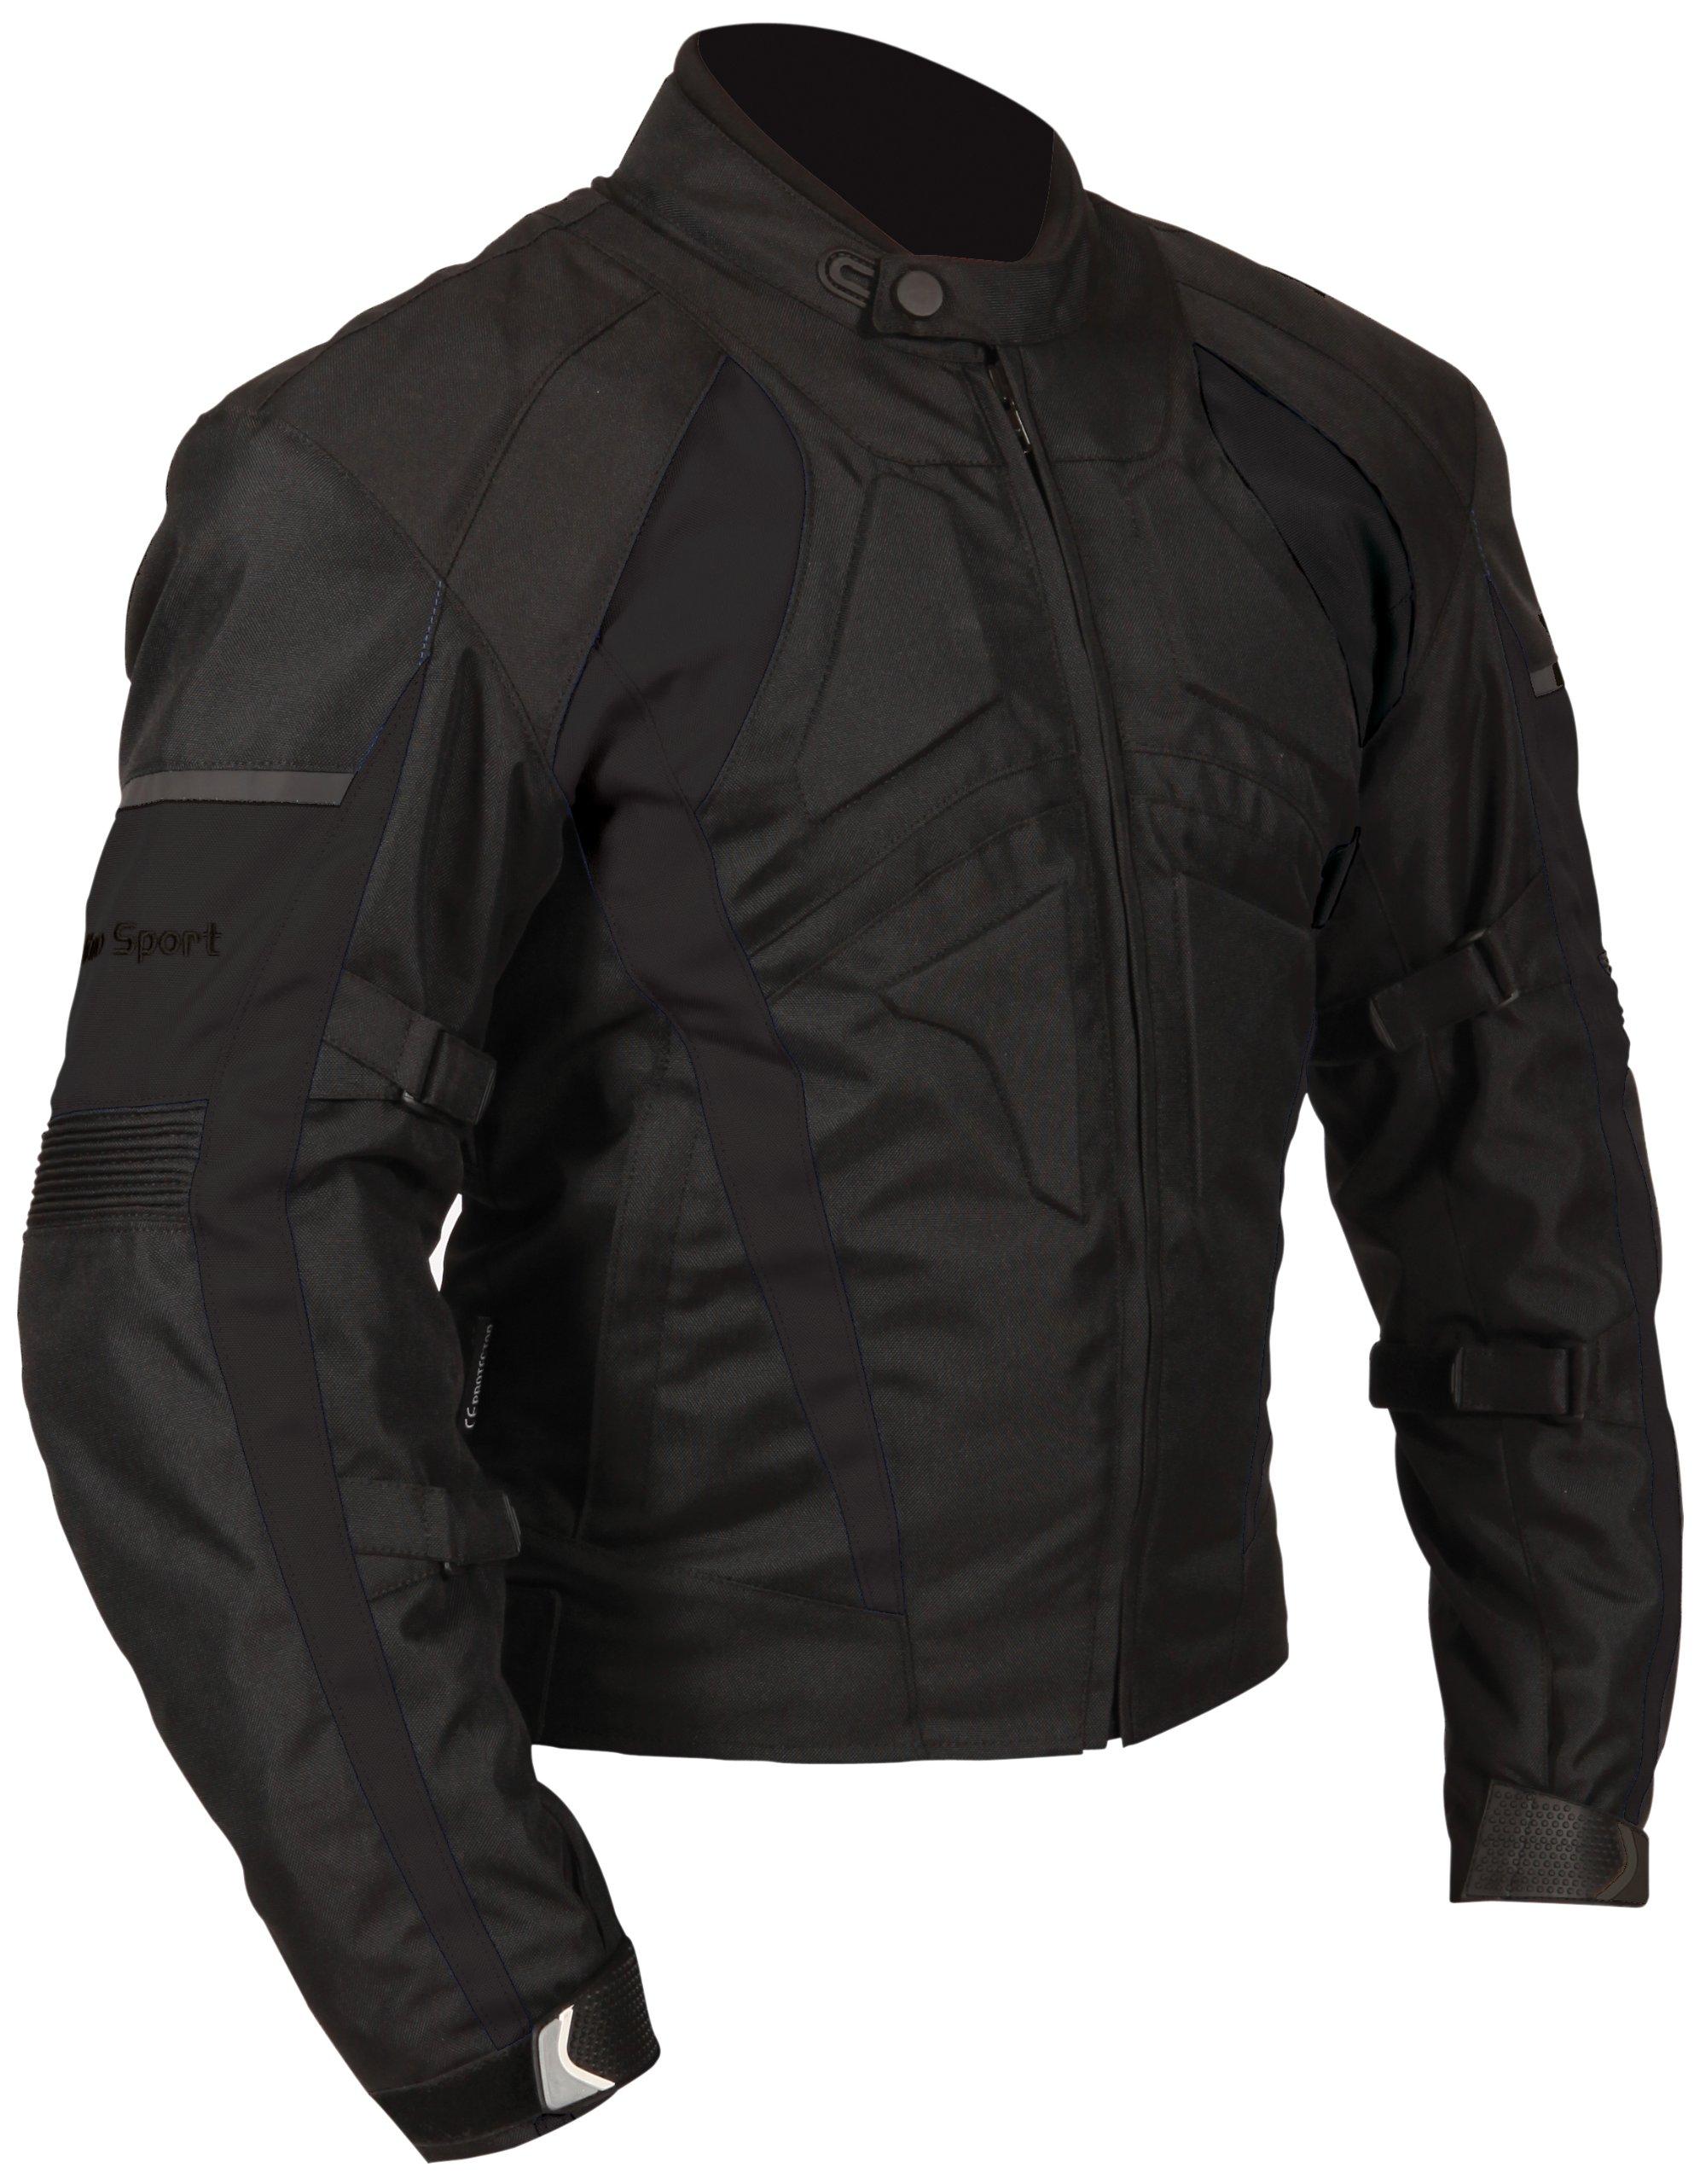 Milano Sport Gamma Motorcycle Jacket (Black, Small)